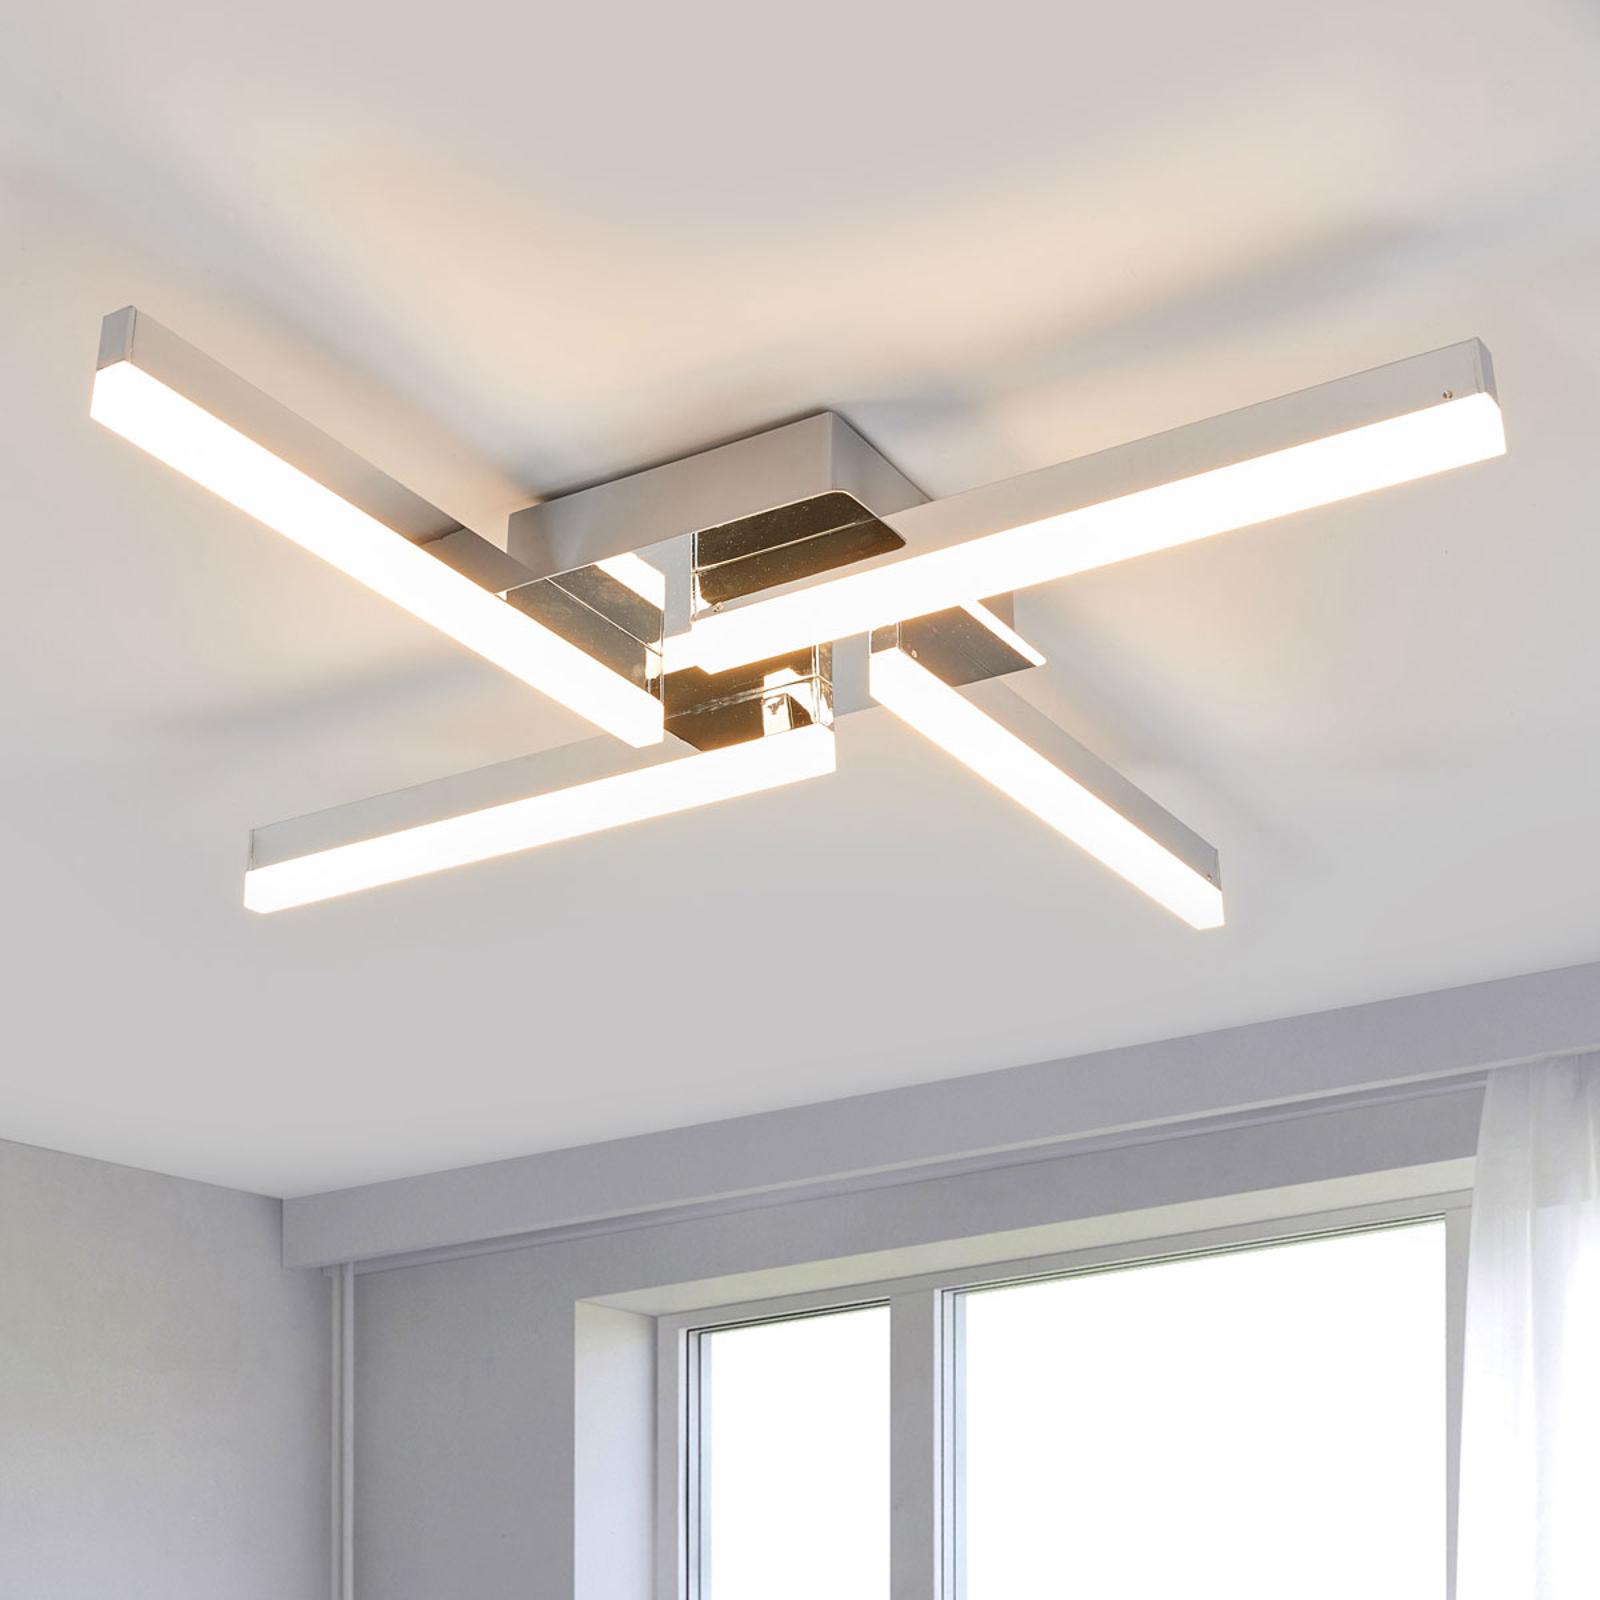 LED-taklampe Patrik med fire lys, IP44